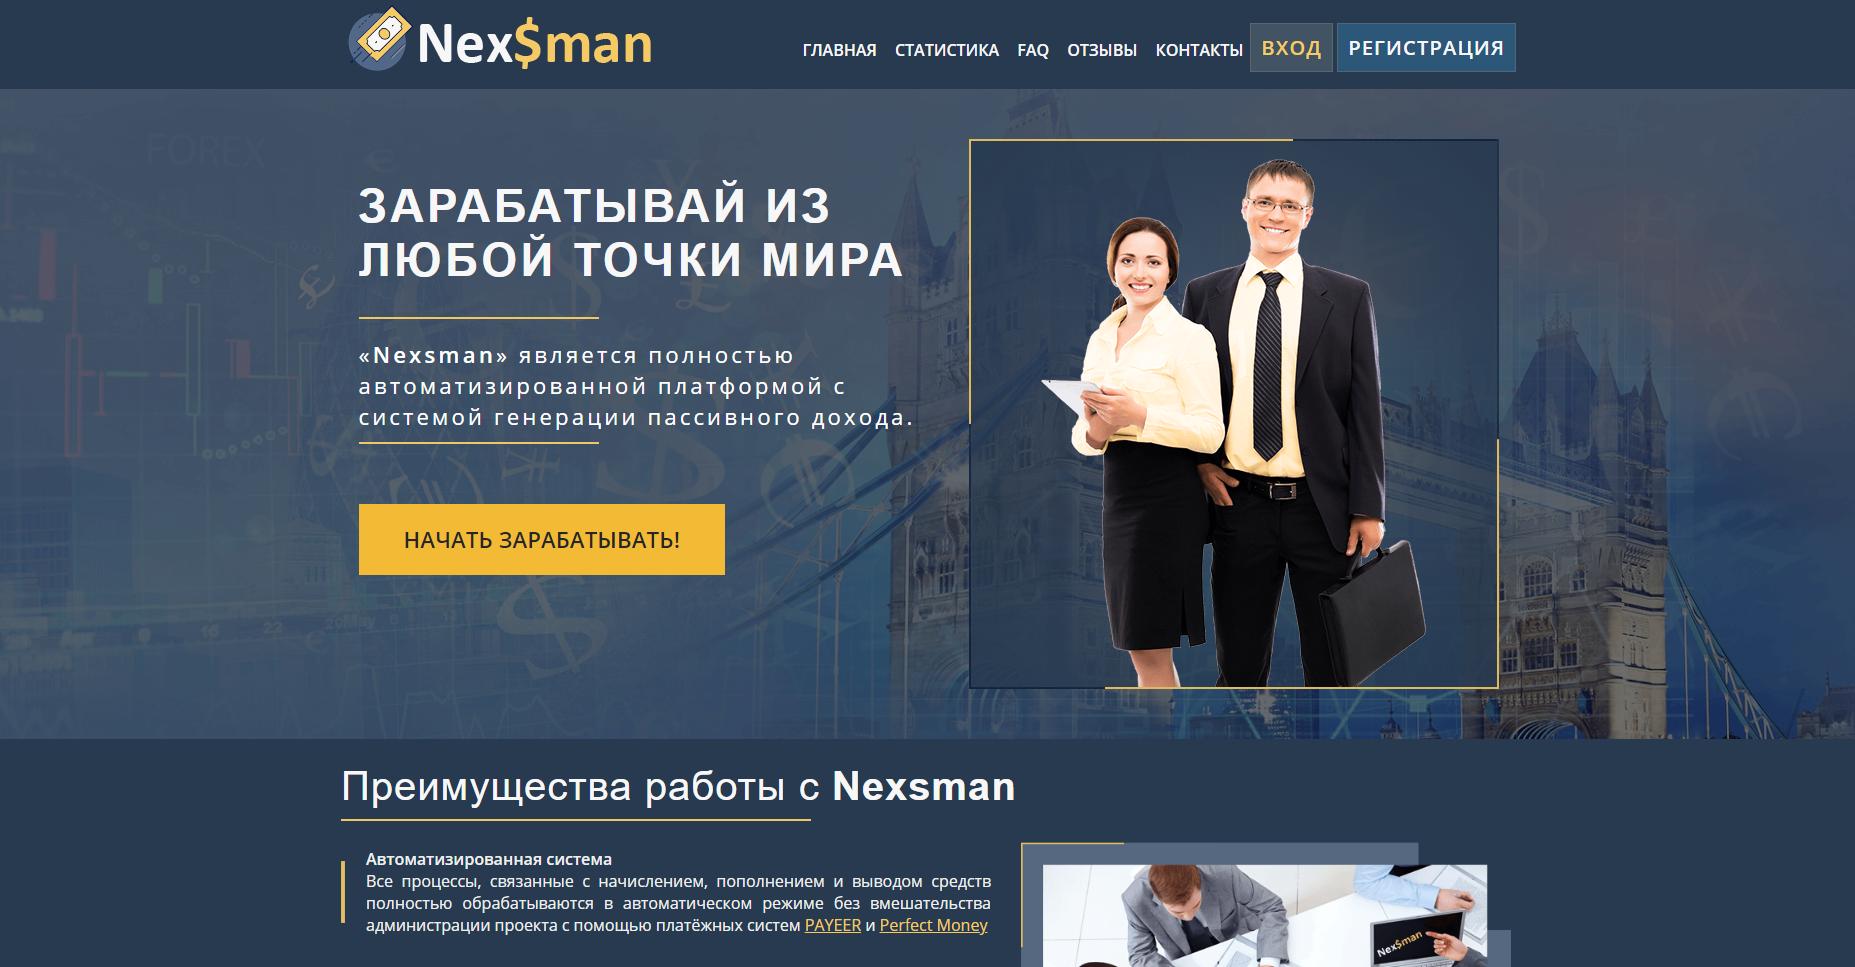 nexsman